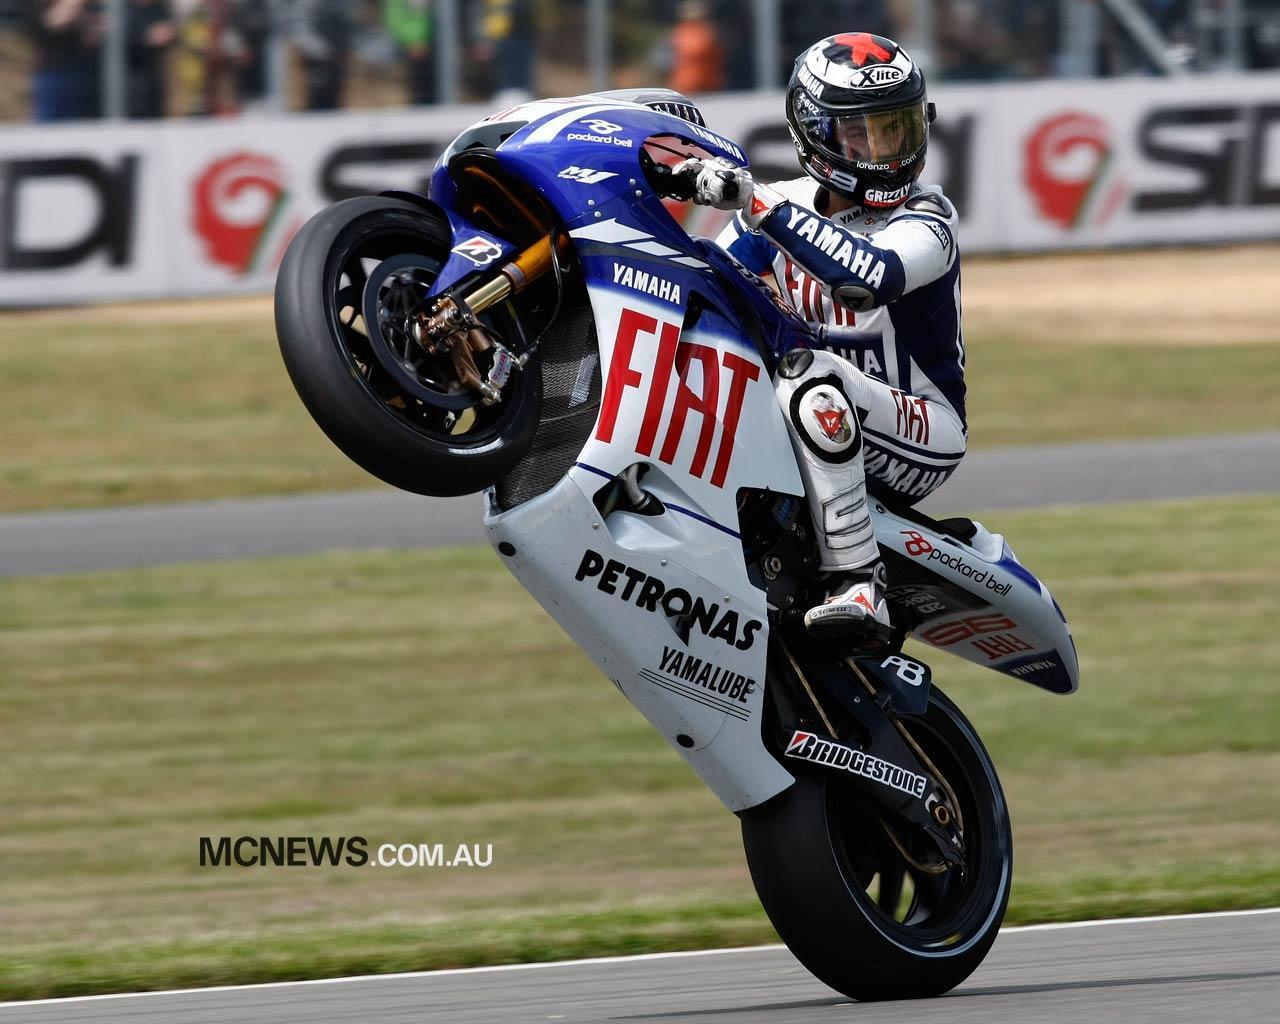 Moto GP Bikes Wallpapers 1280x1024